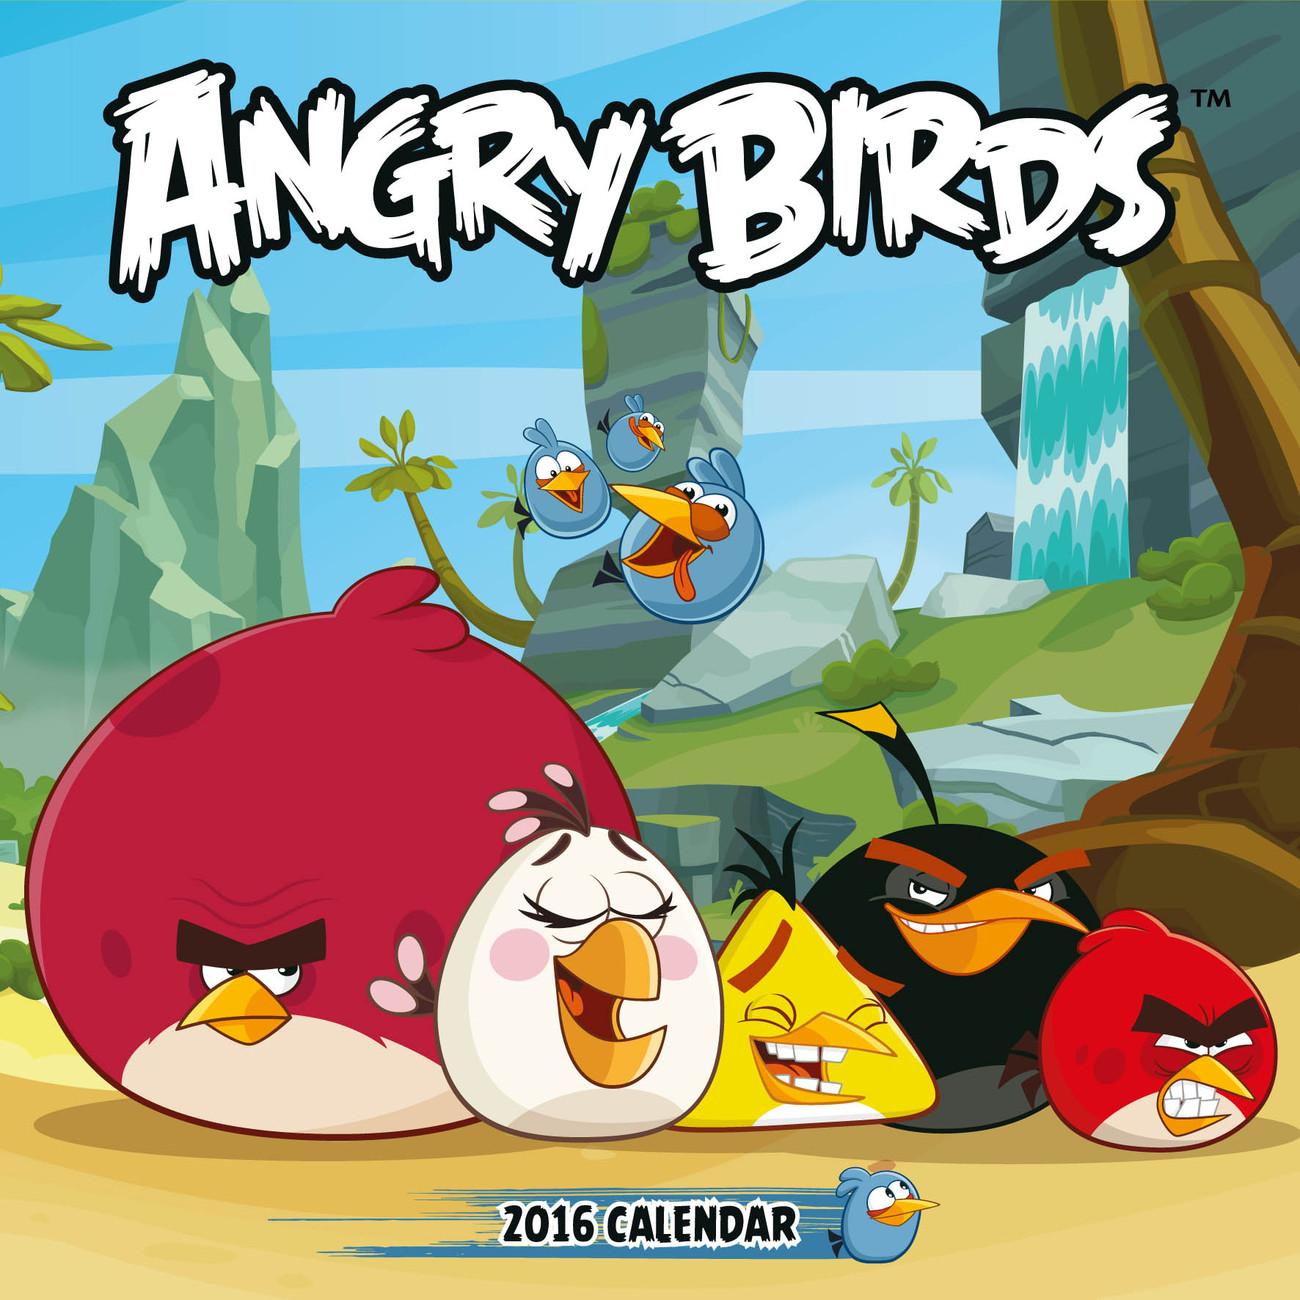 Angry Birds - Kalendář 2019 na Posters.cz 93cb4fd55a